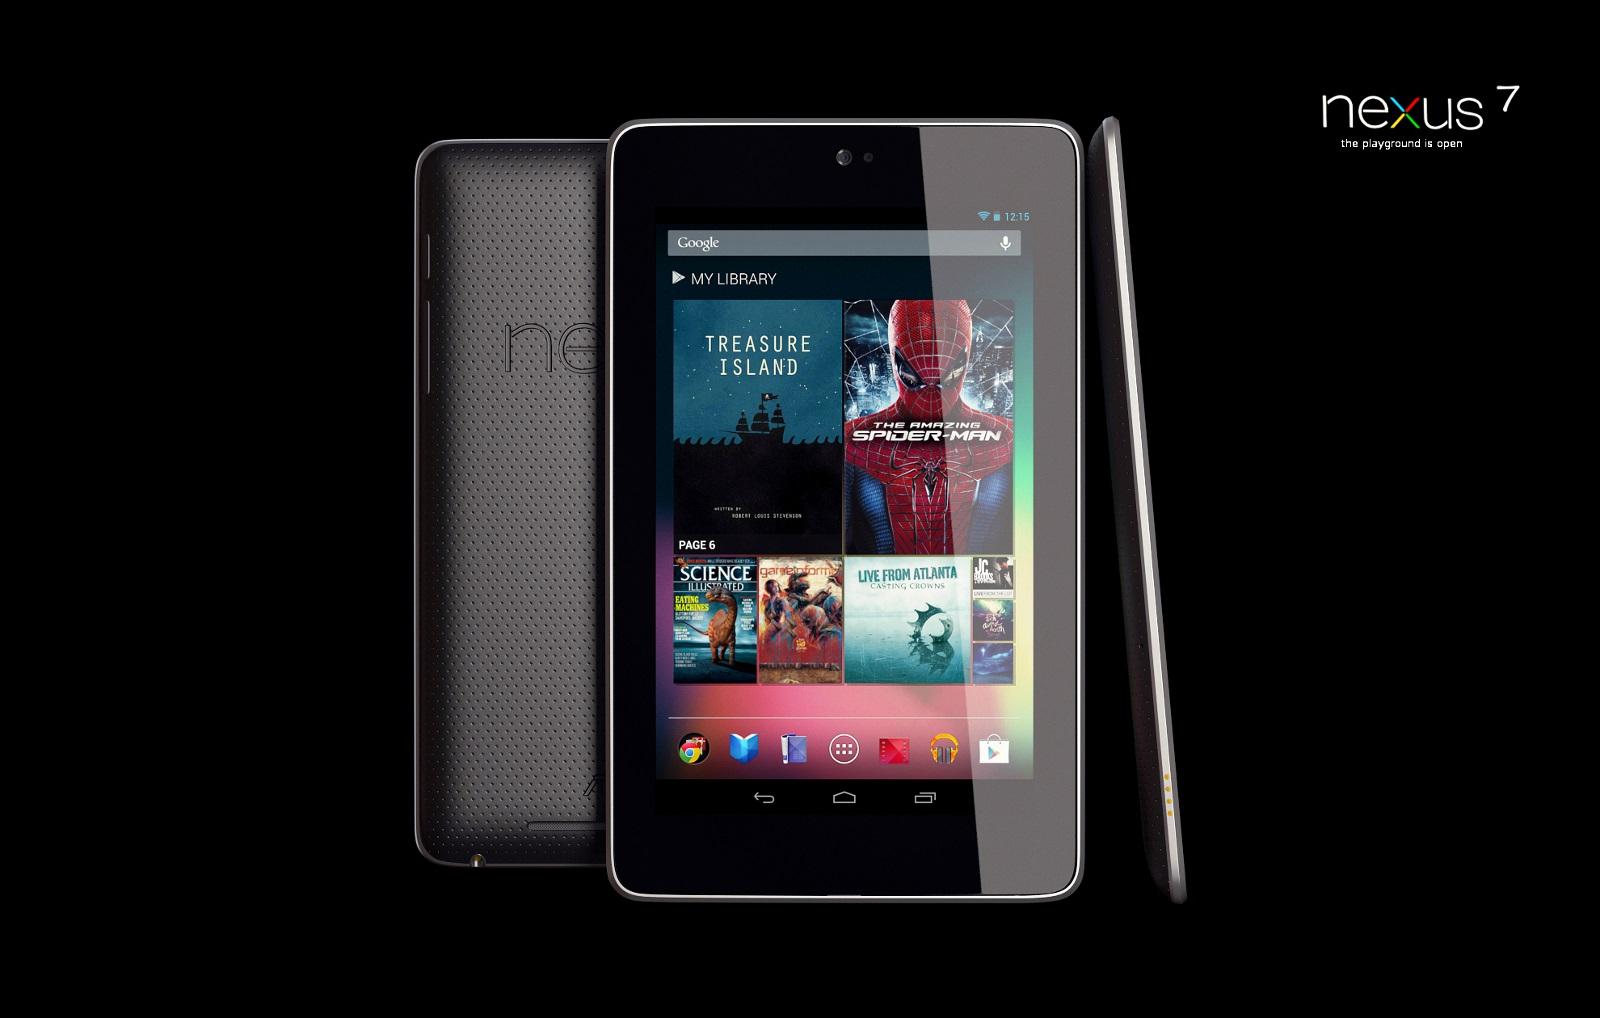 Nexus 7 Wallpaper Resolution - WallpaperSafari